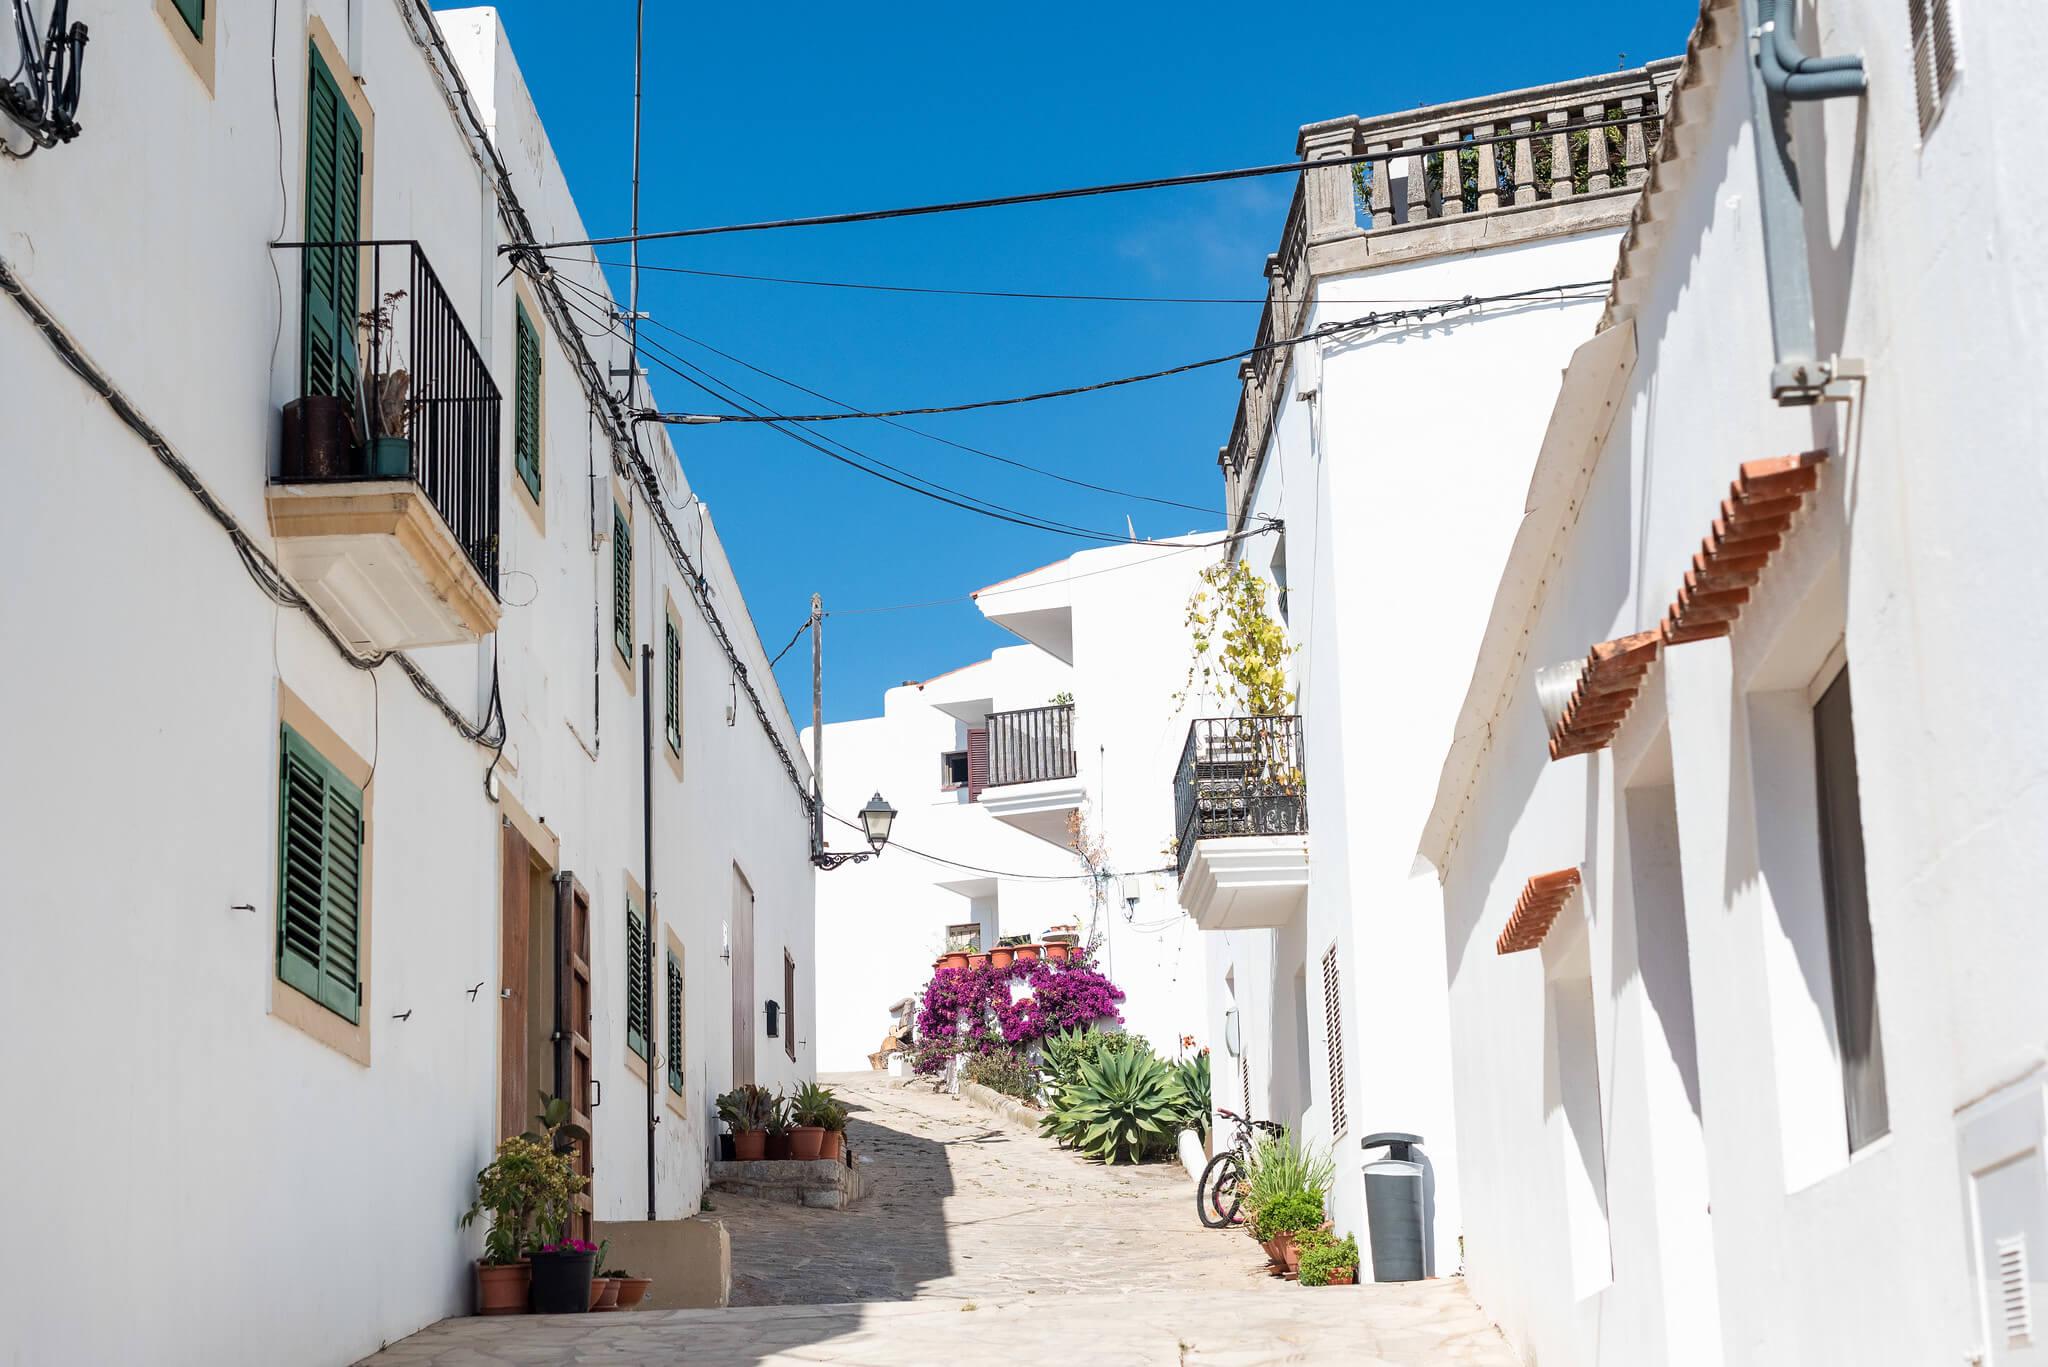 https://www.white-ibiza.com/wp-content/uploads/2020/05/white-ibiza-villas-where-to-buy-san-juan-10.jpg